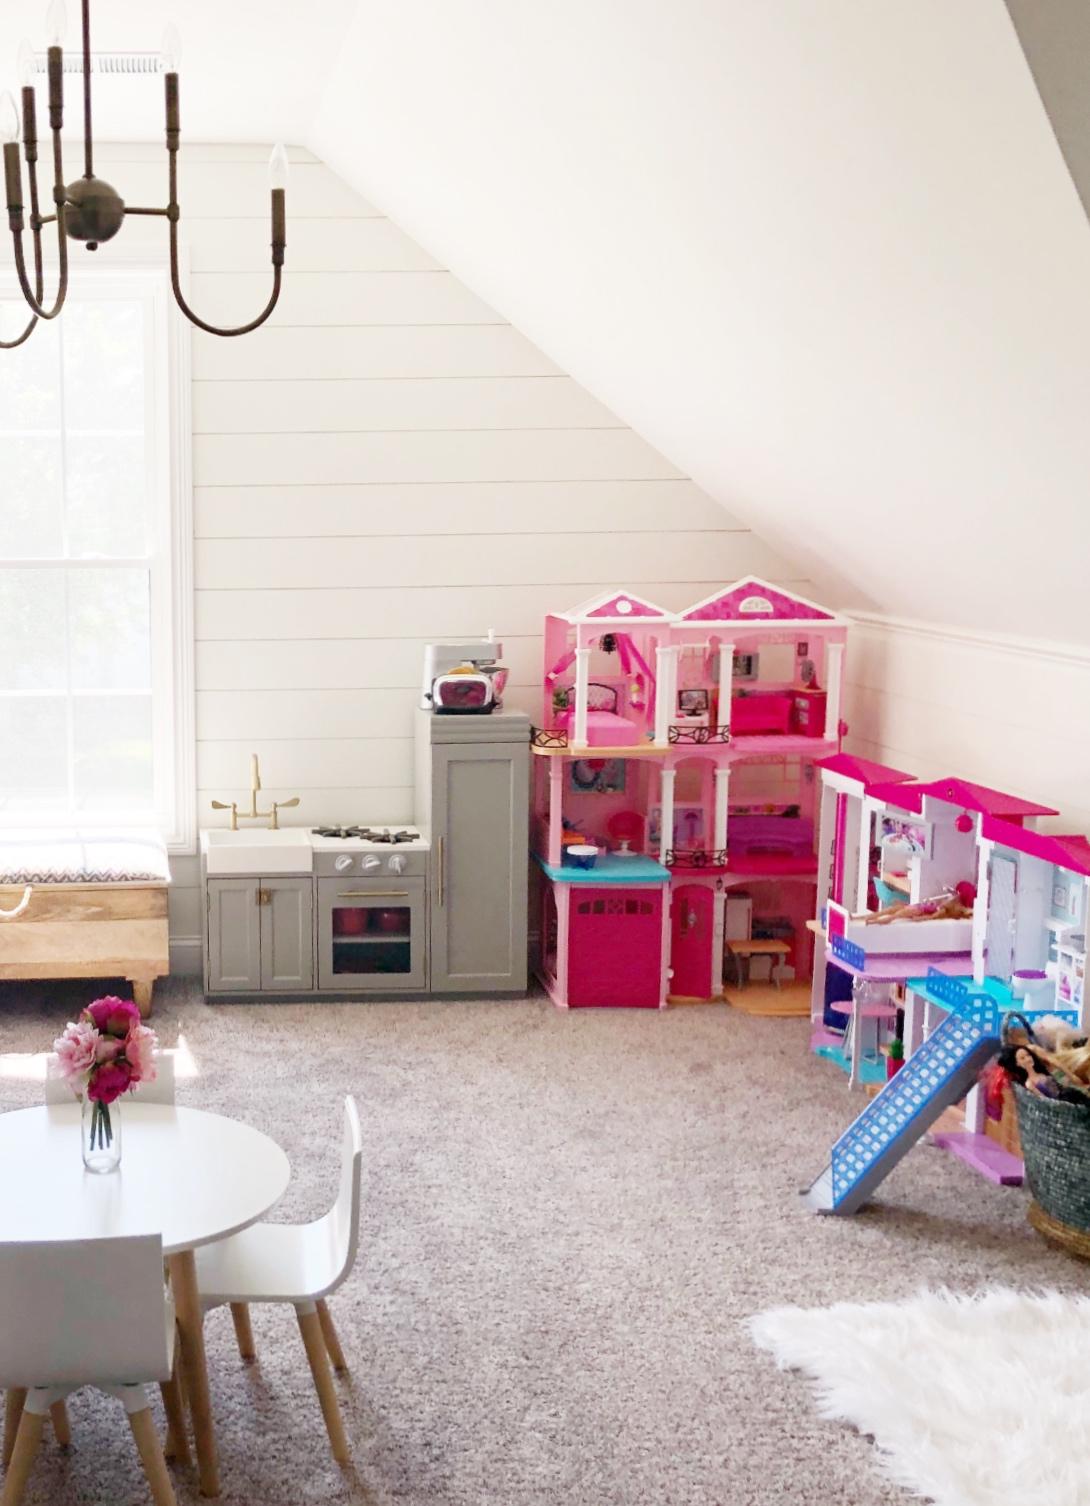 shiplap walls in playroom